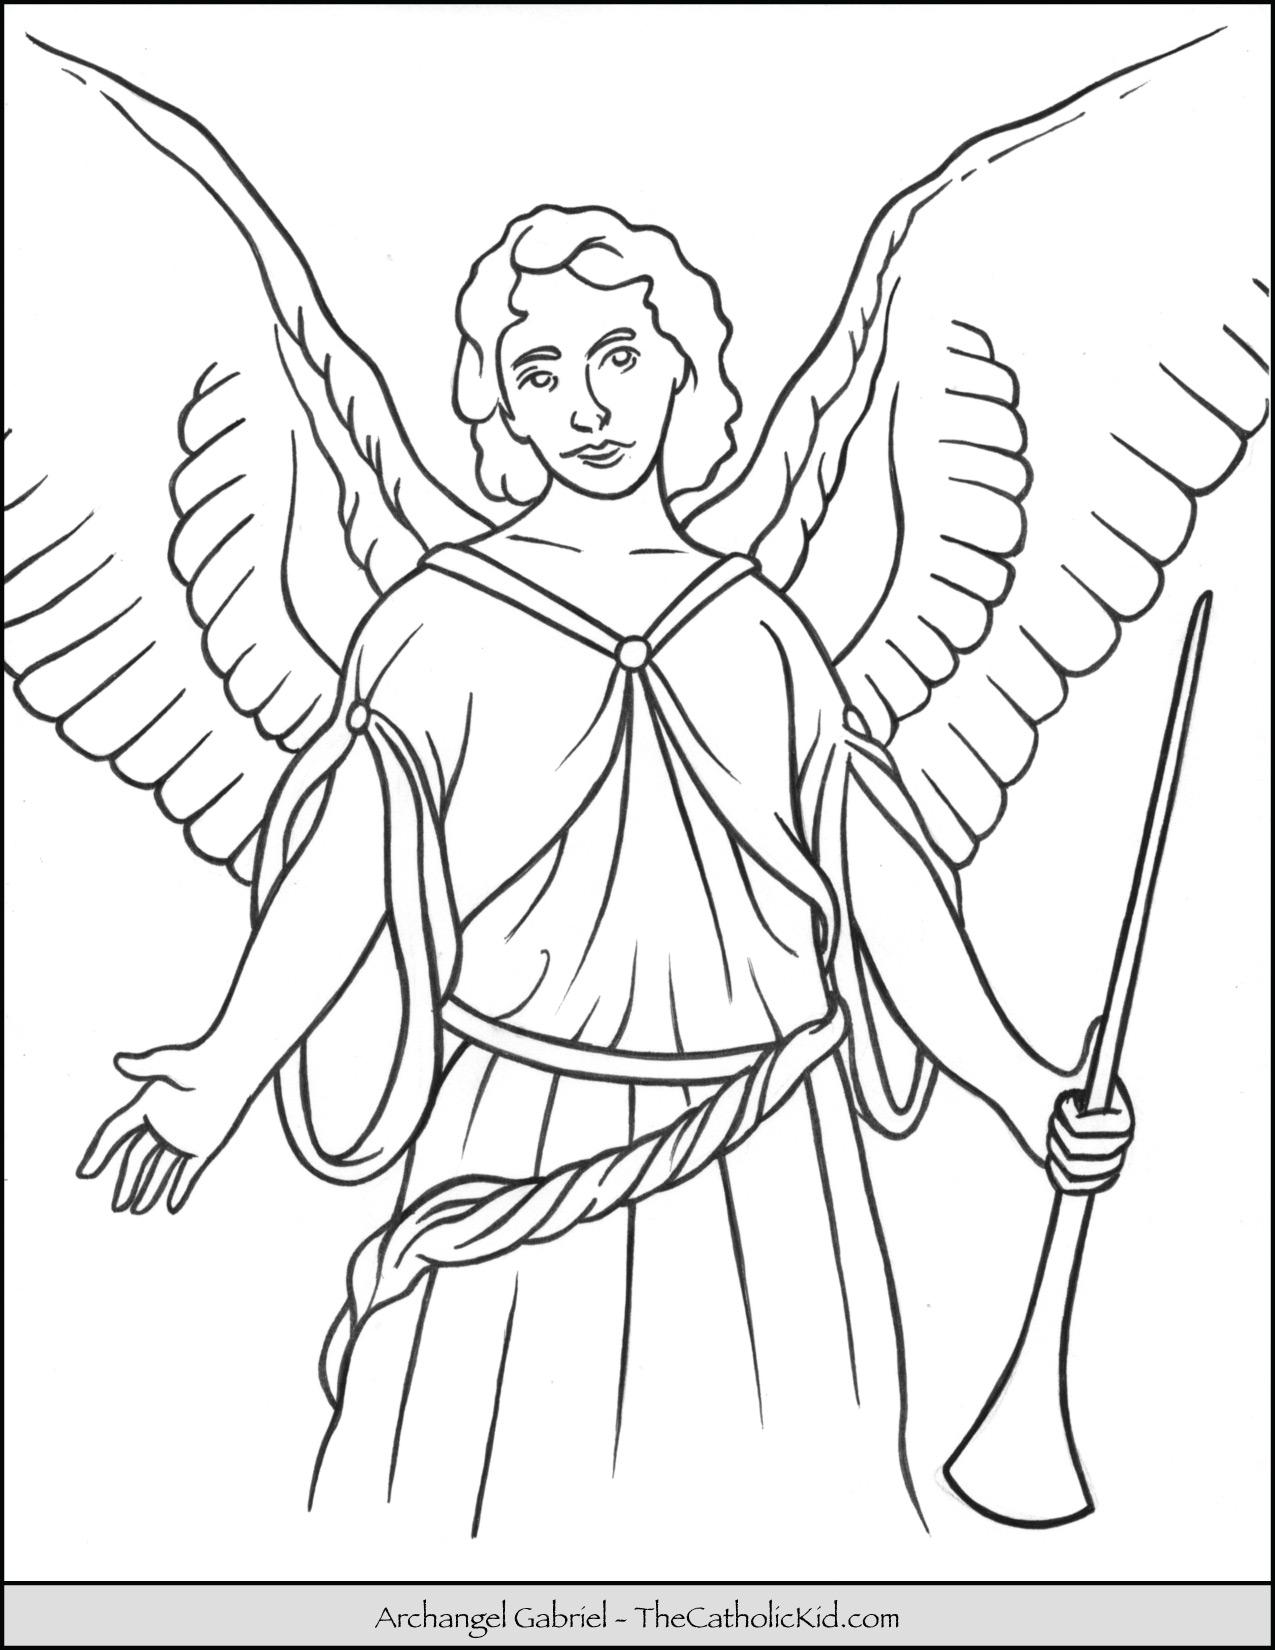 Archangel Gabriel